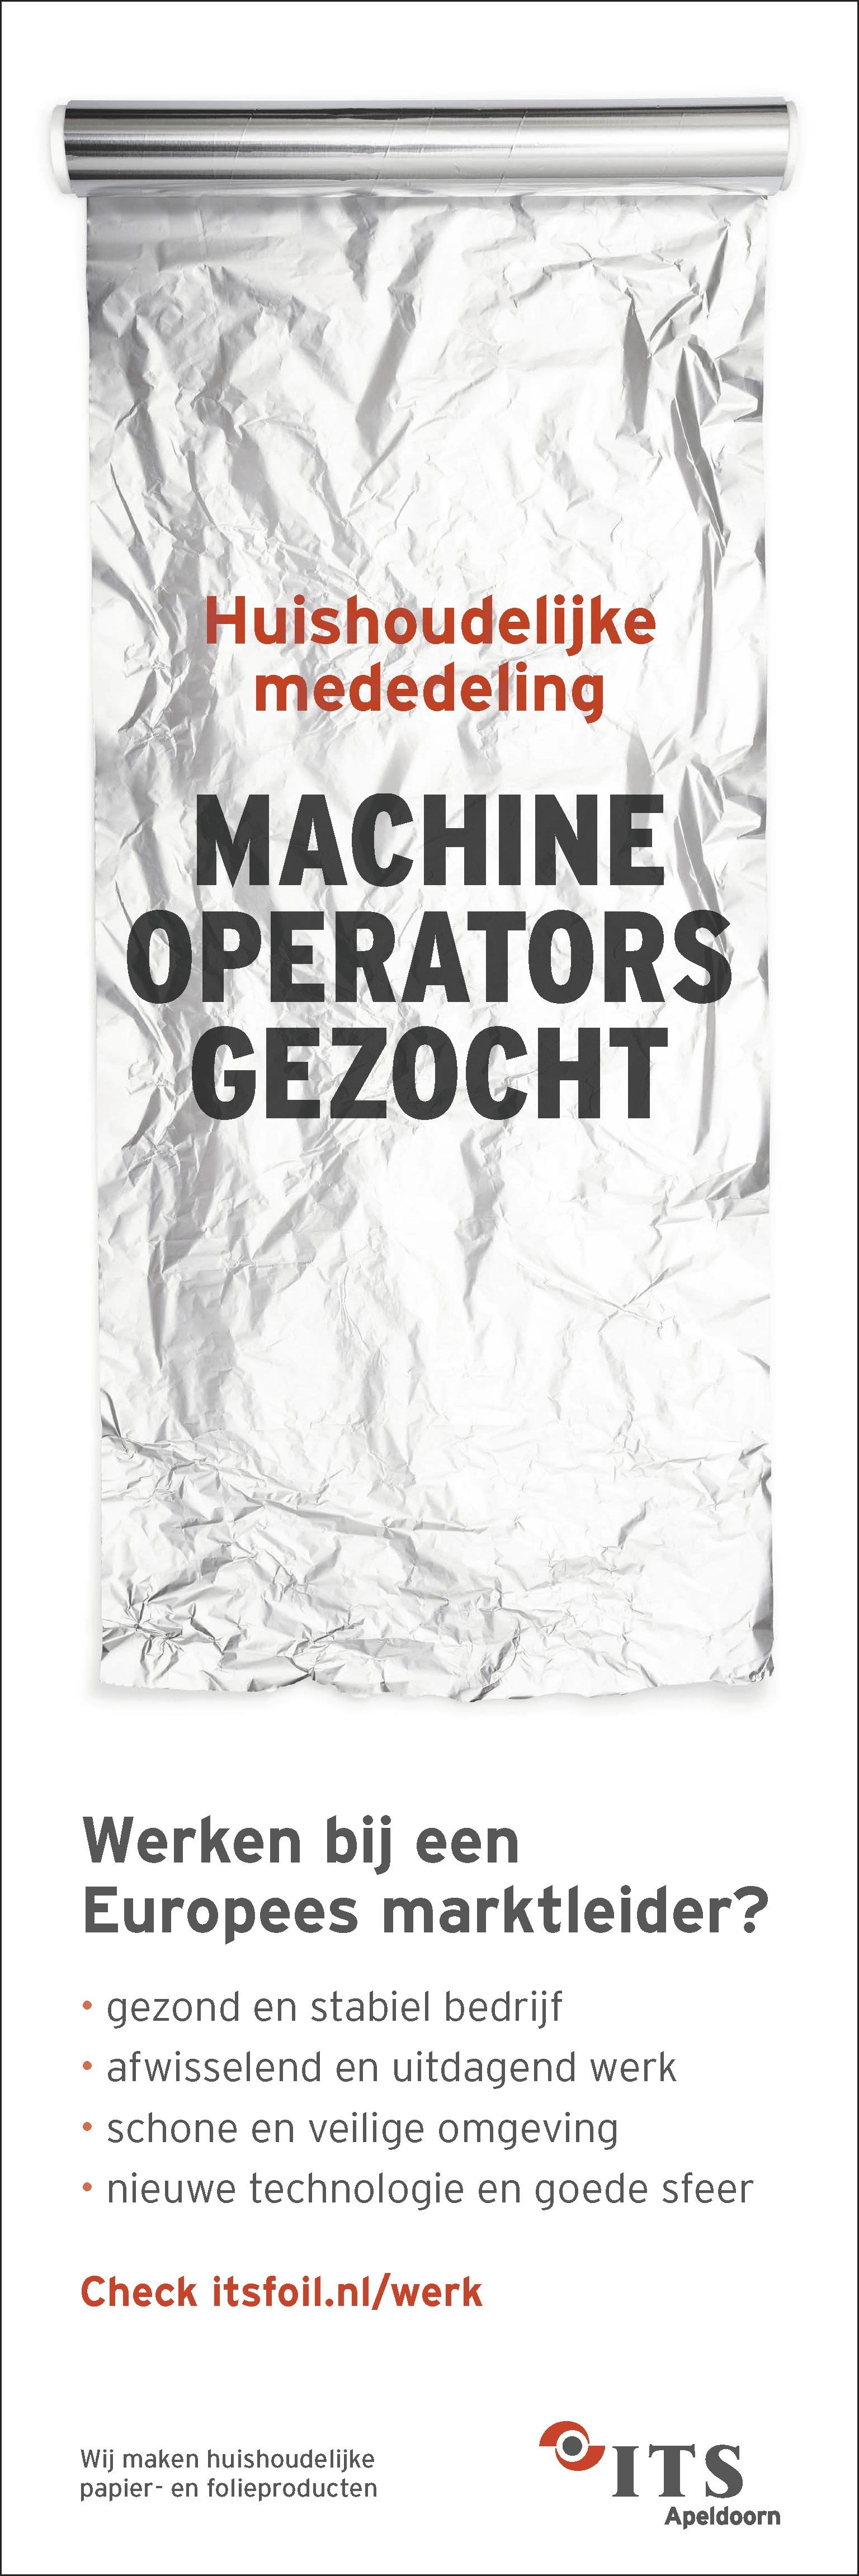 MACHINE OPERATORS GEZOCHT